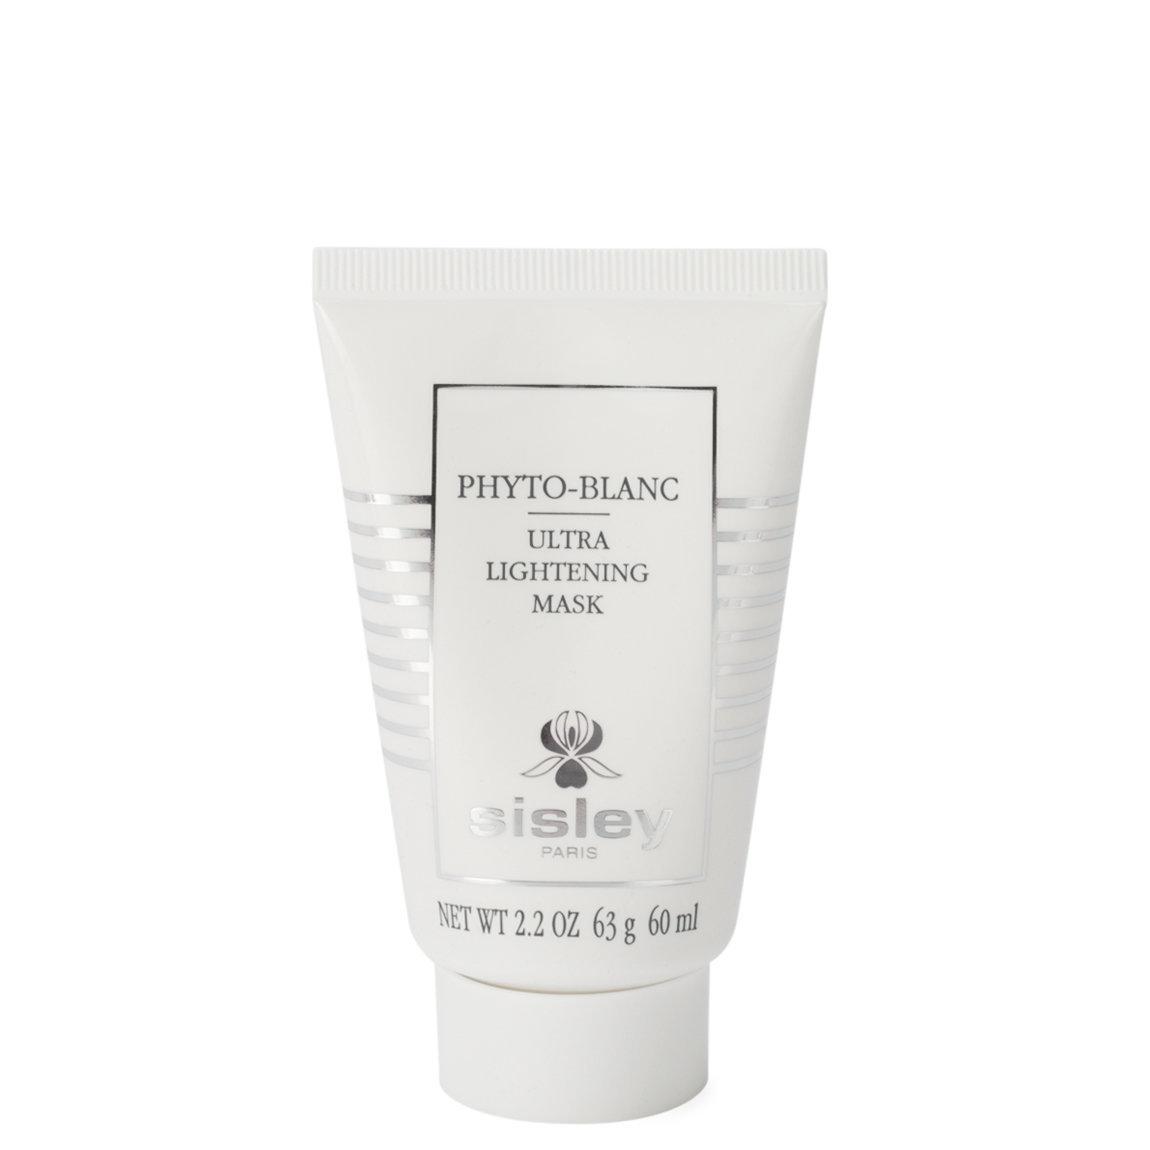 Sisley-Paris Phyto-Blanc Ultra Lightening Mask alternative view 1 - product swatch.